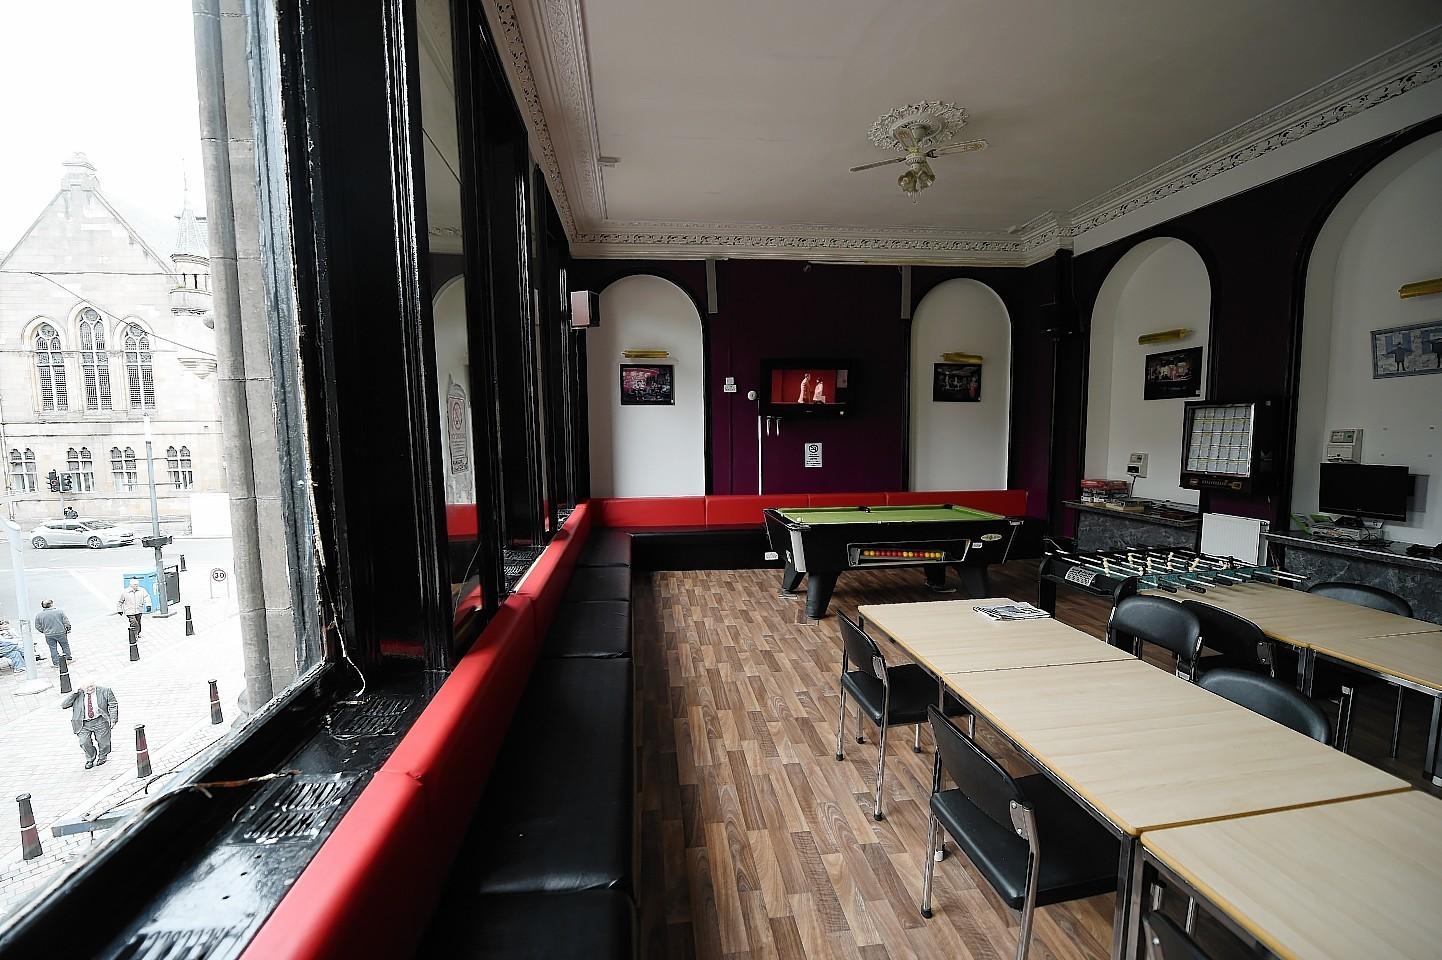 Inside the Highlander hostel